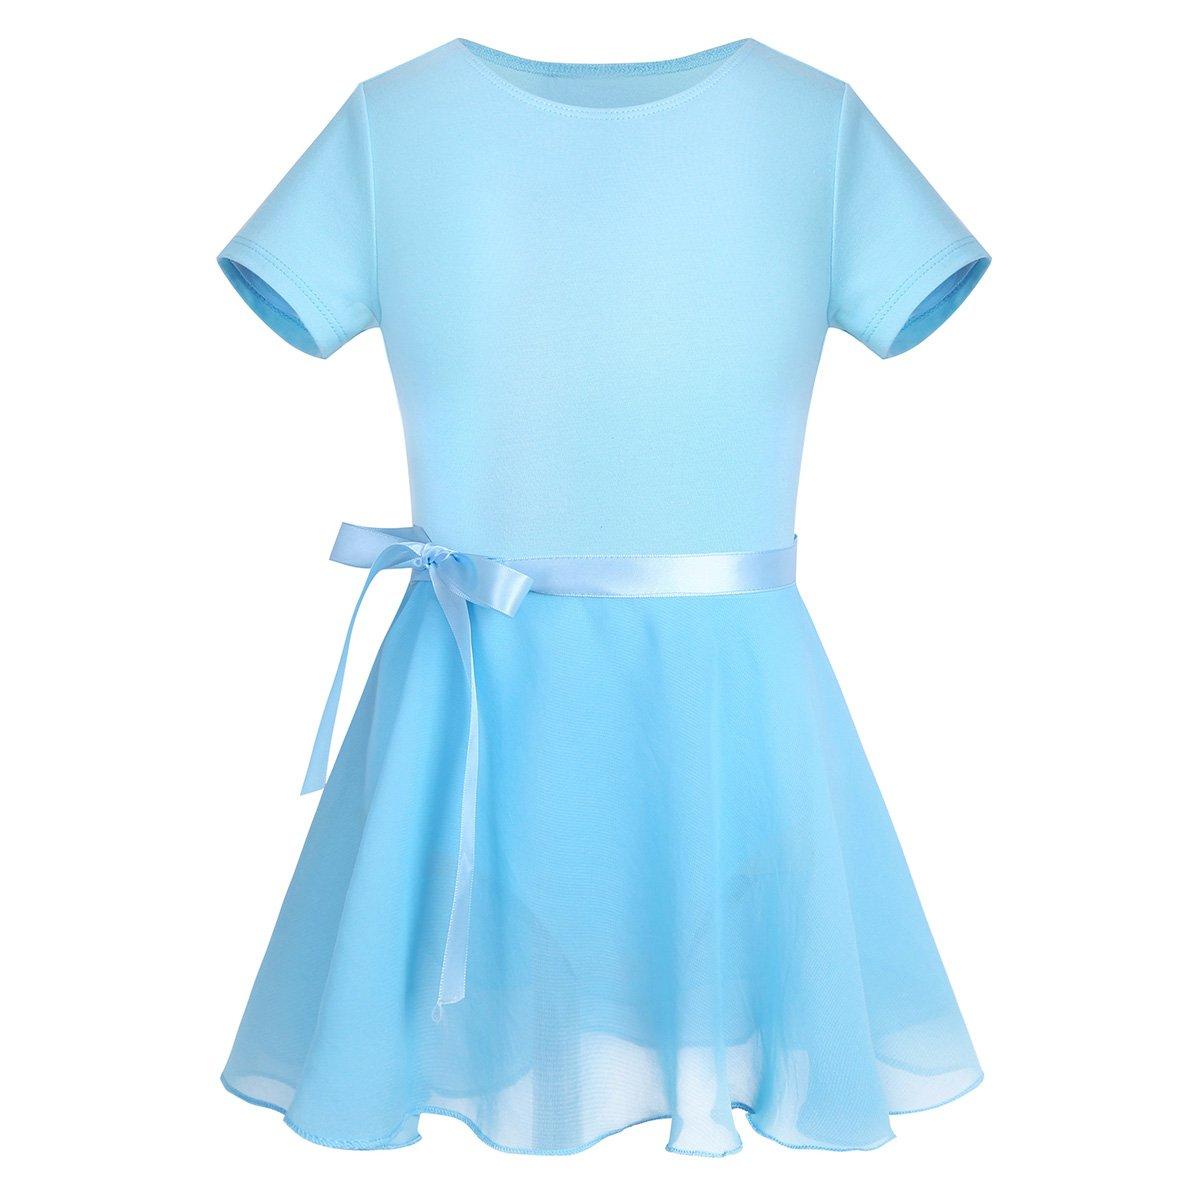 TiaoBug Girls Kids Cotton Ballet Tutu Dress Gymnastics Leotard Bodysuit with Chiffon Wrap Skirt Dance Costume